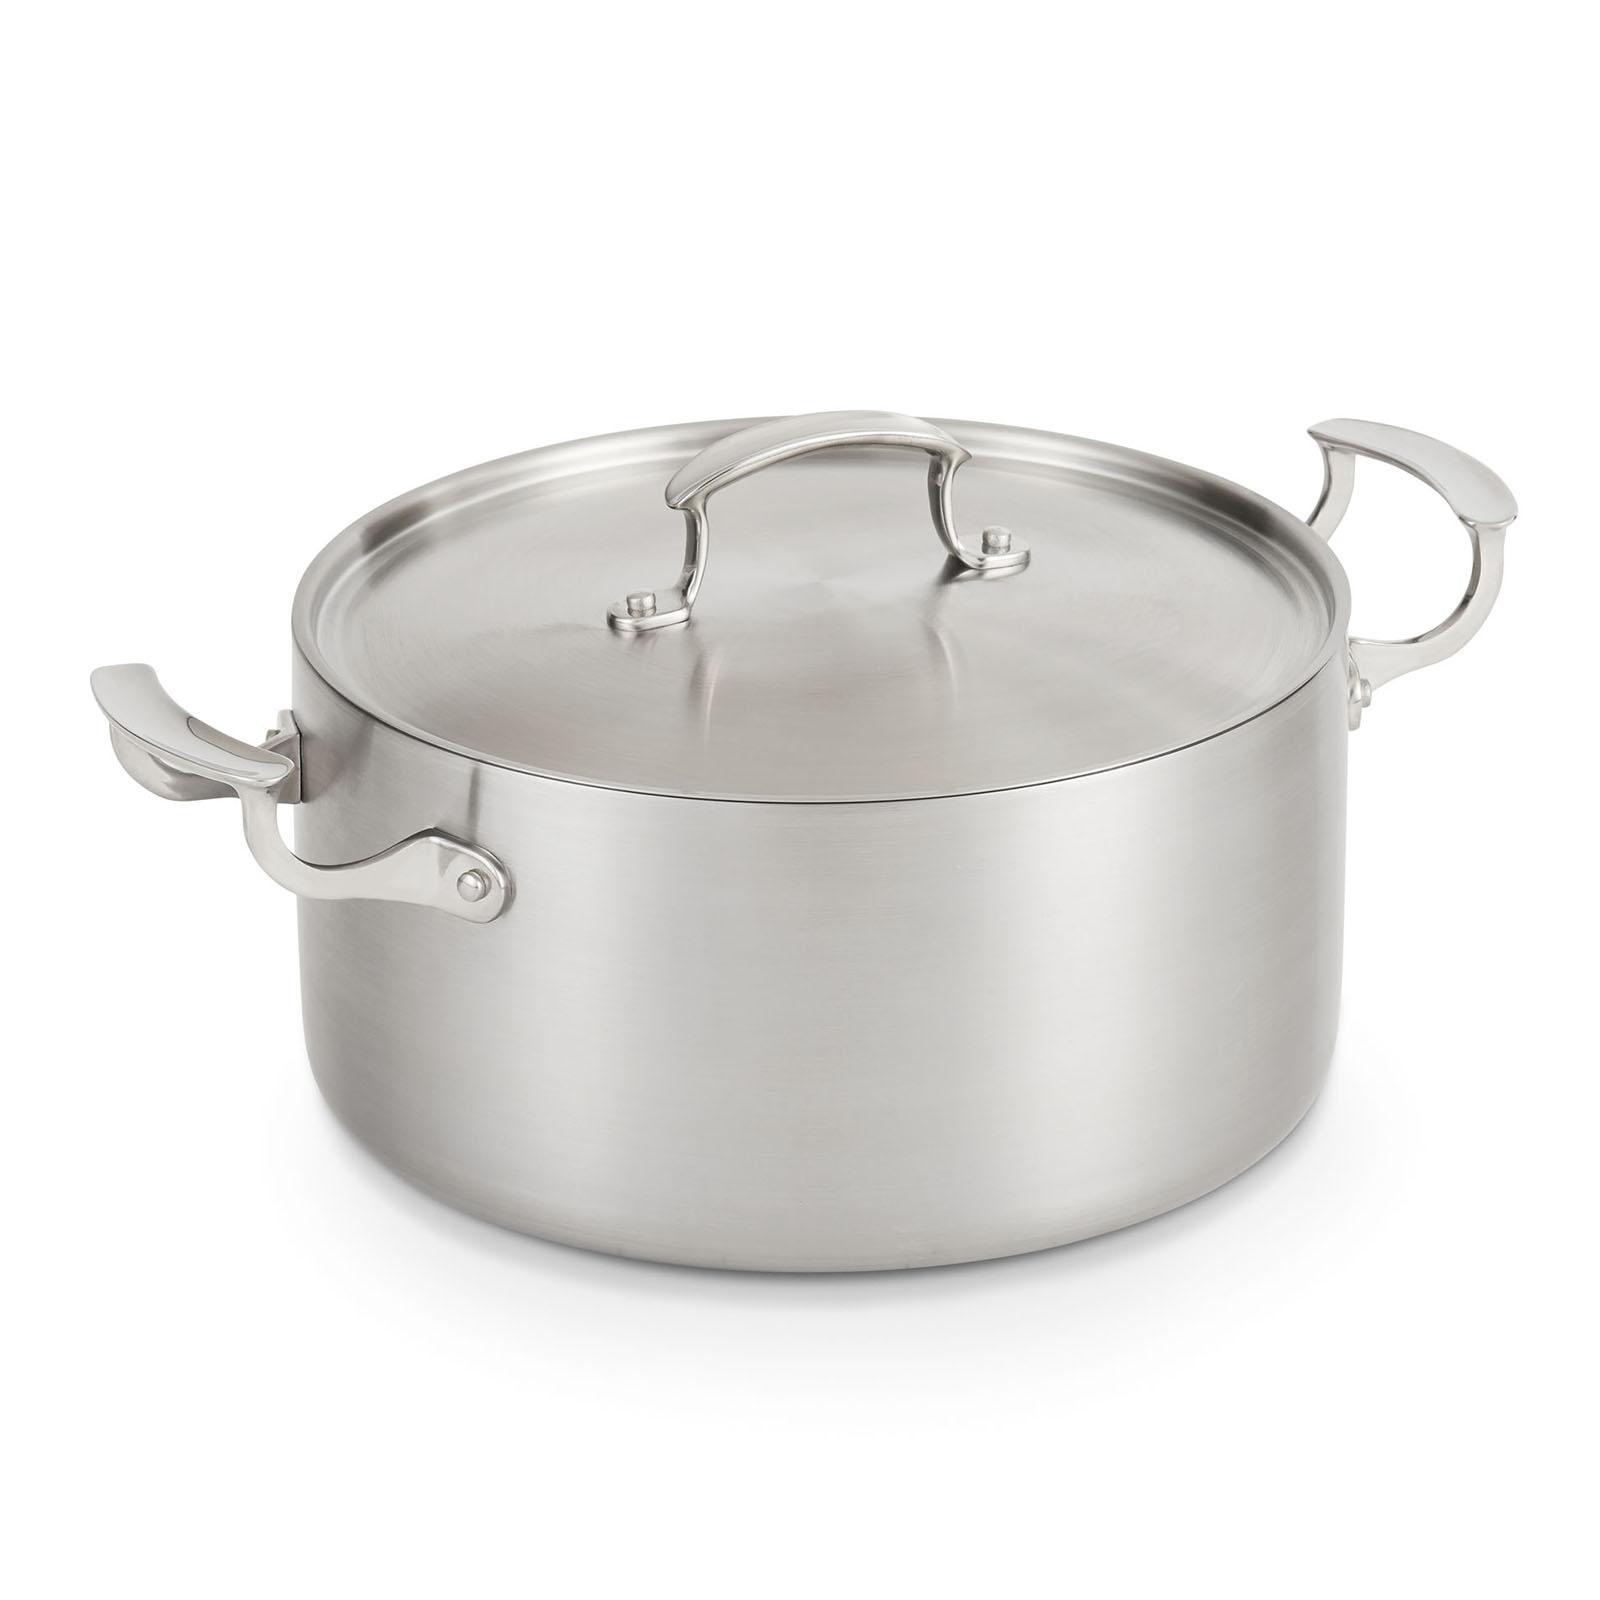 Vollrath 49441 casserole dish